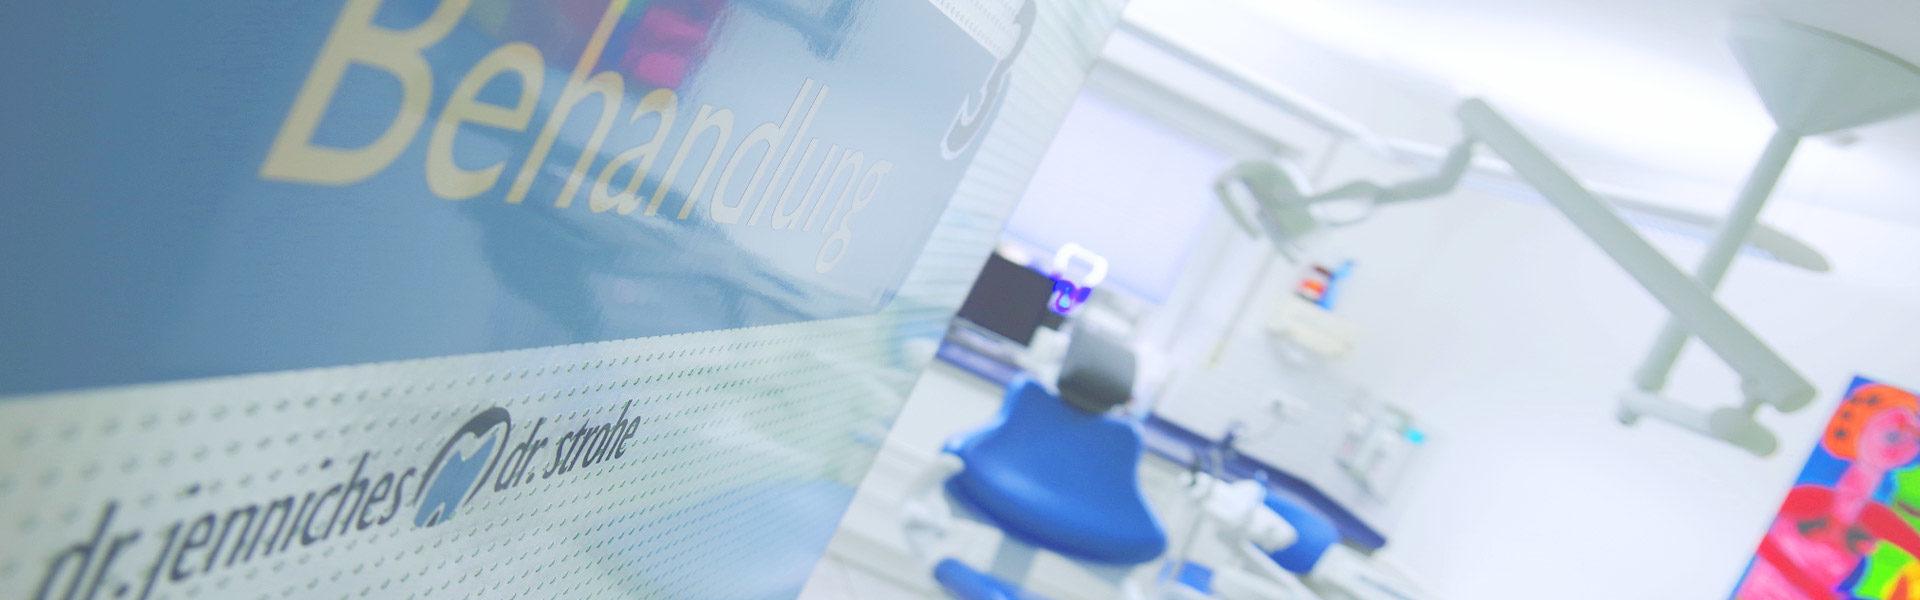 Zahnarztpraxis Dr. Jenniches & Dr. Strohe